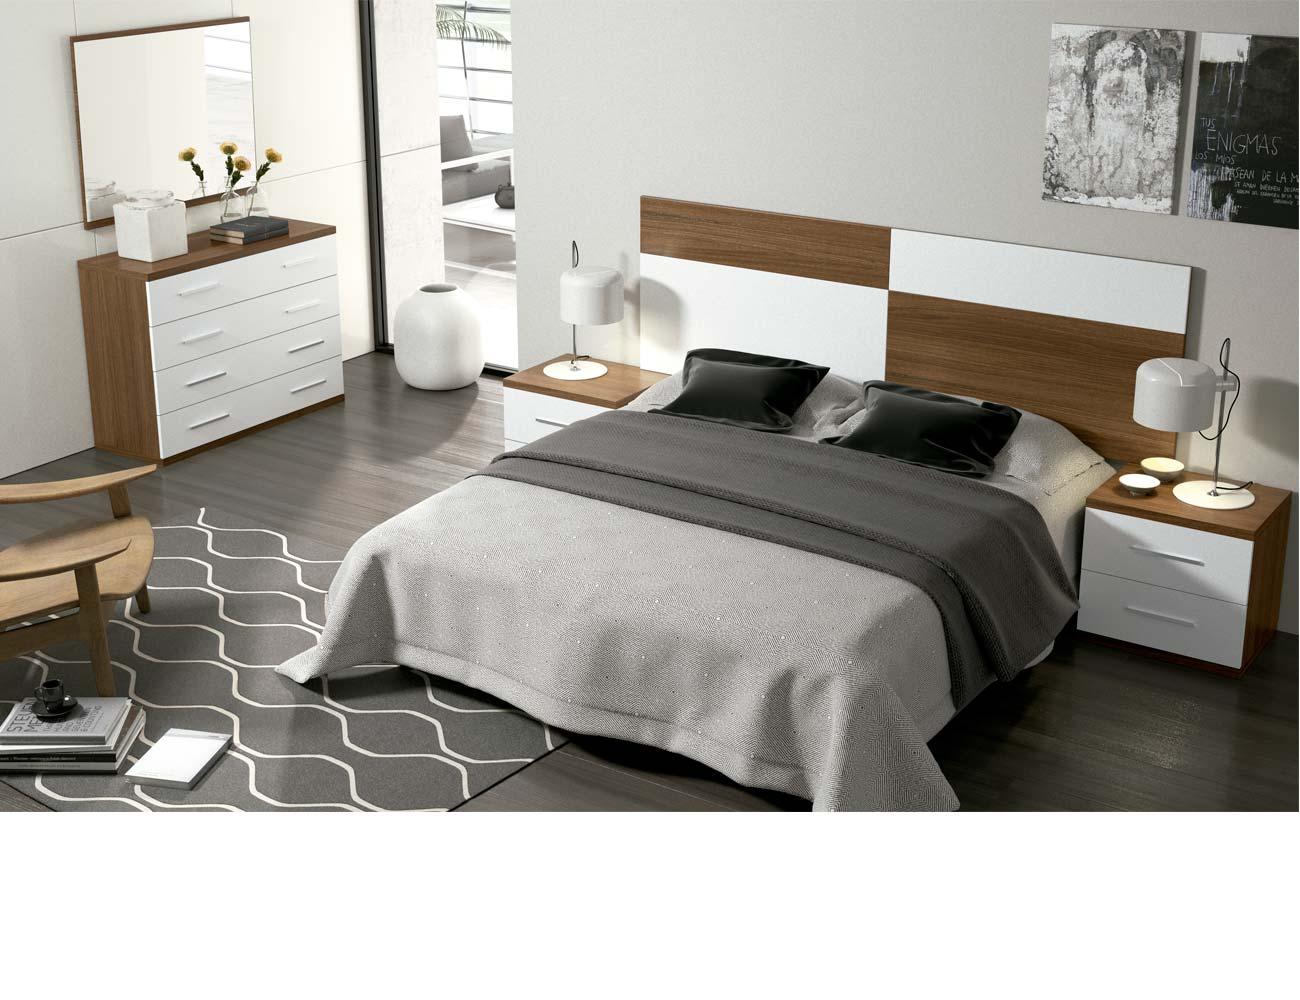 Dormitorio matrimonio moderno 27 nogal blanco